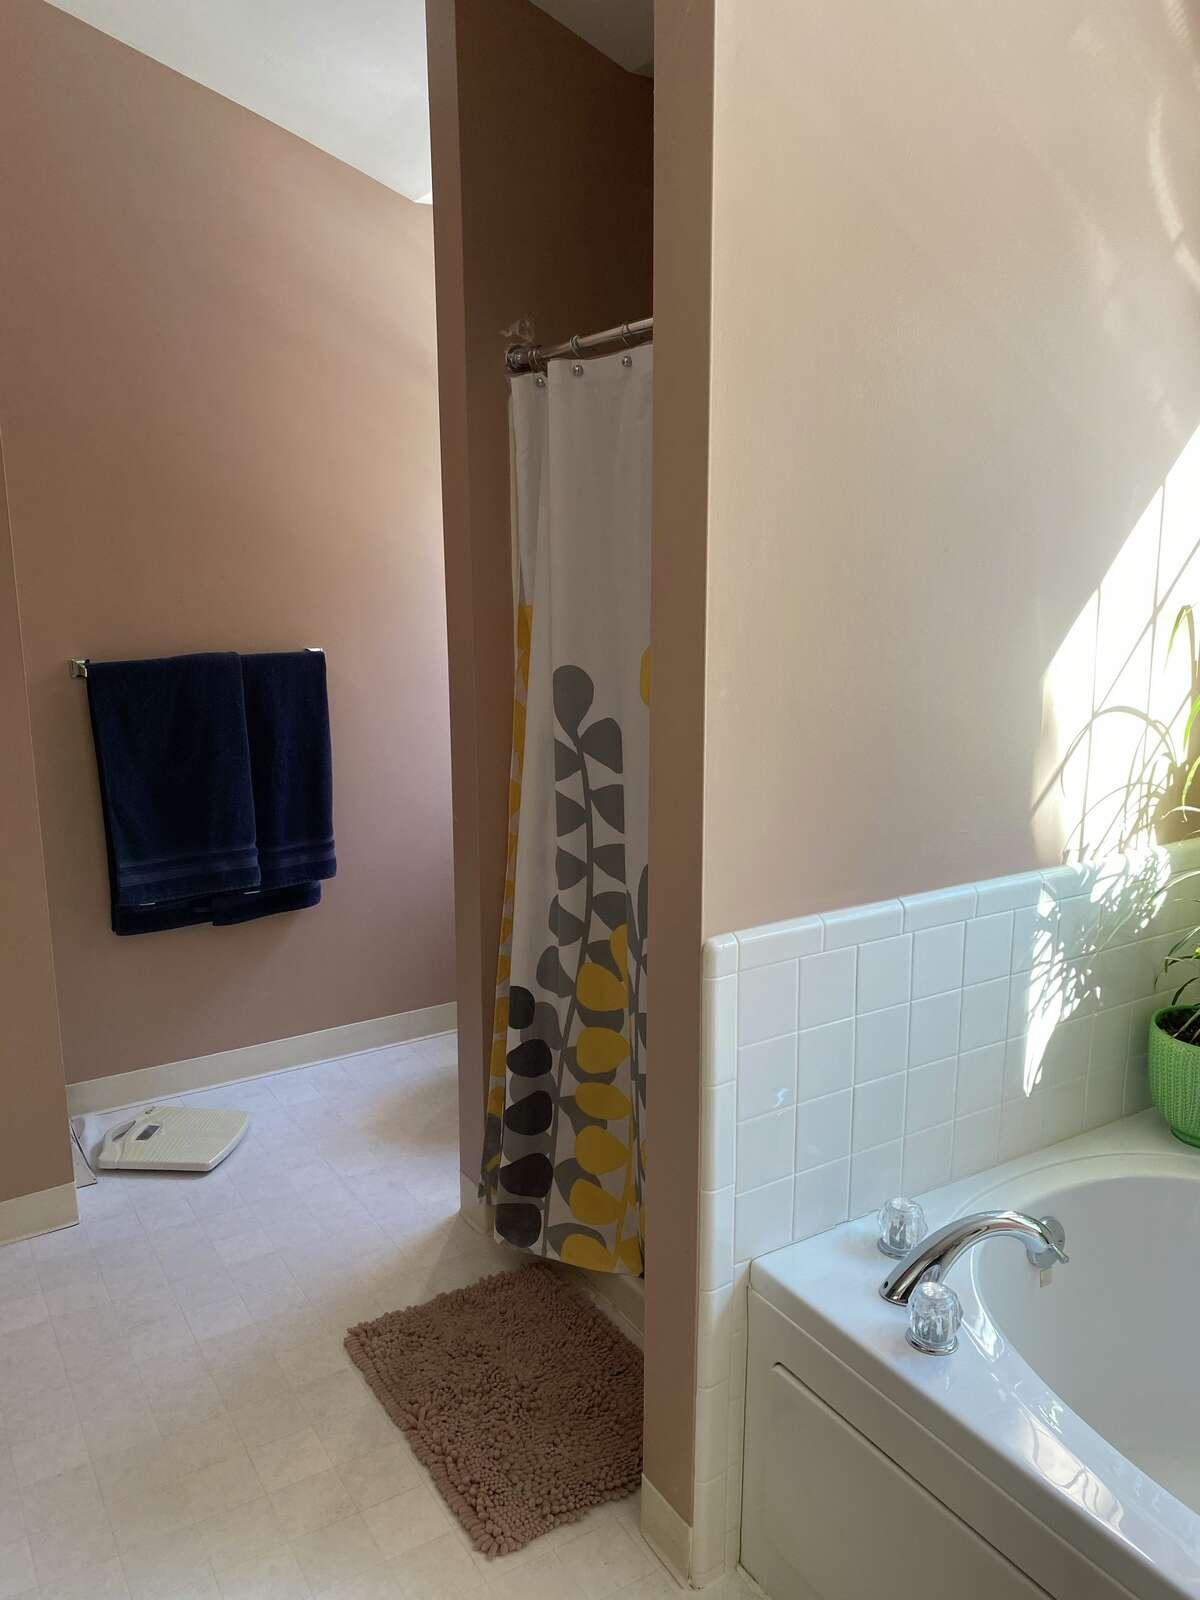 Interior designer Julie Maleski Putzel recommends Leigh Hornbeck replace the vinyl flooring with luxury vinyl plank.